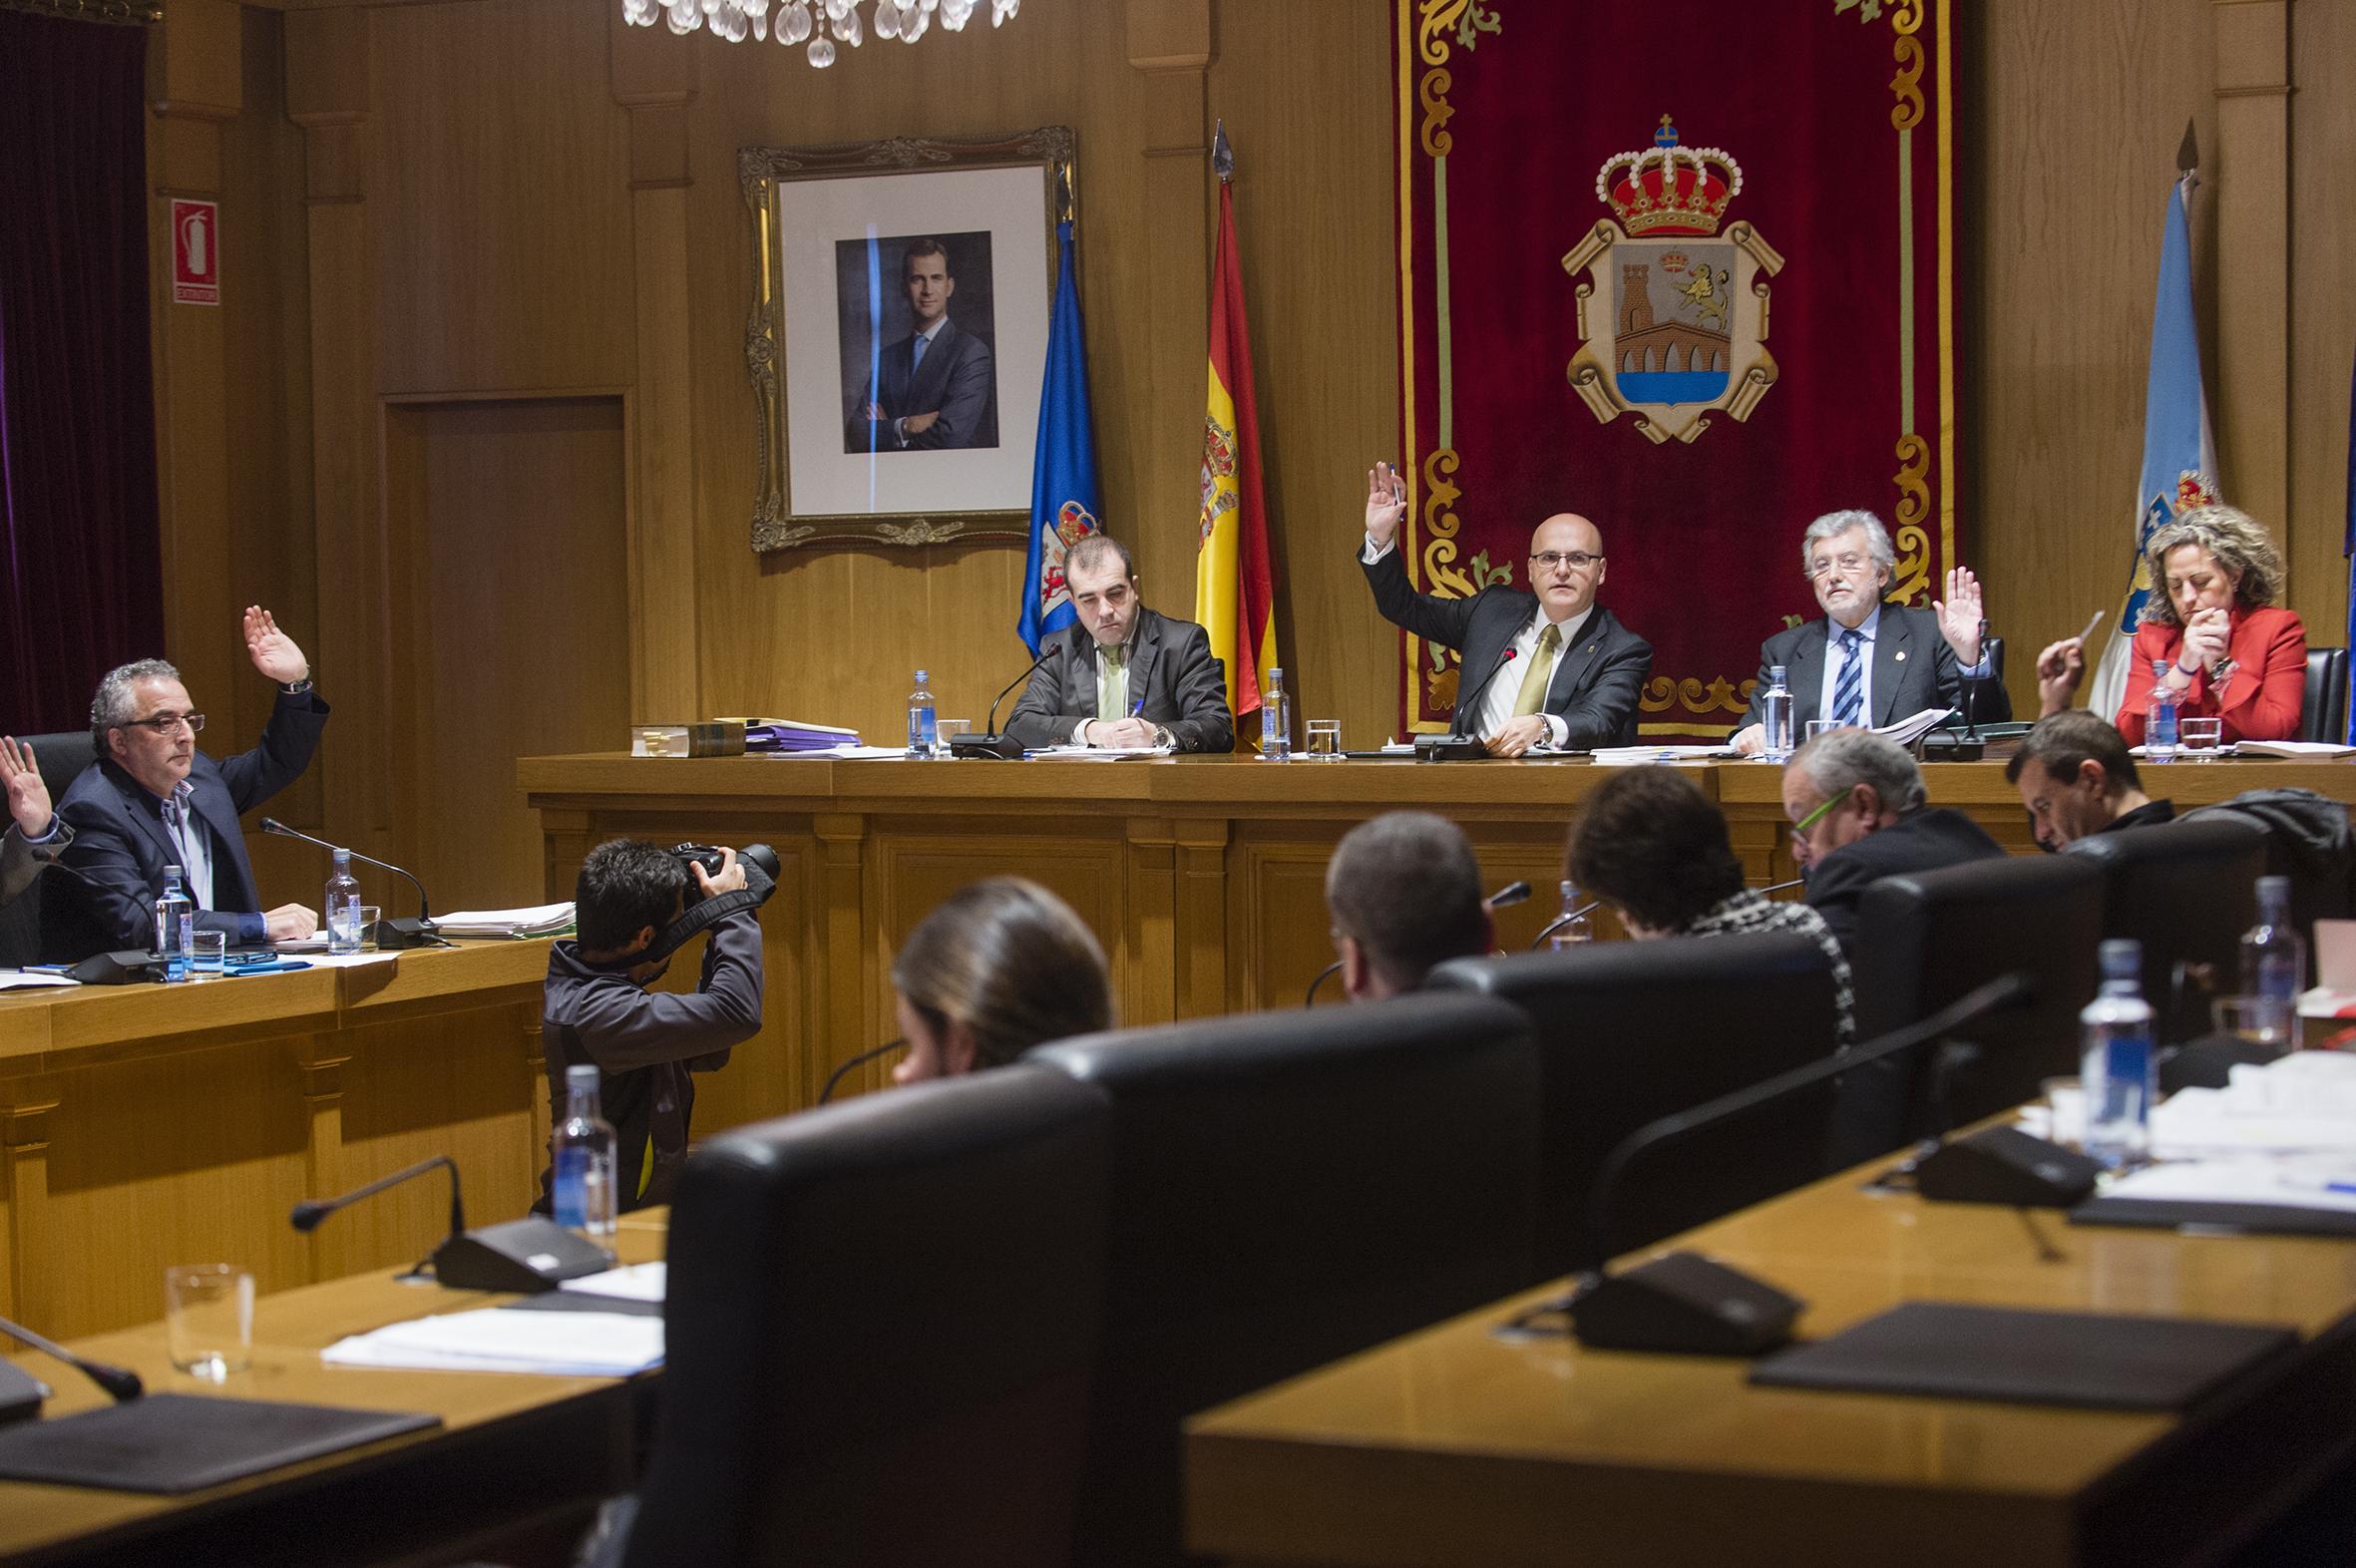 Pleno ordinario correspondente ó mes de decembro de 2014.